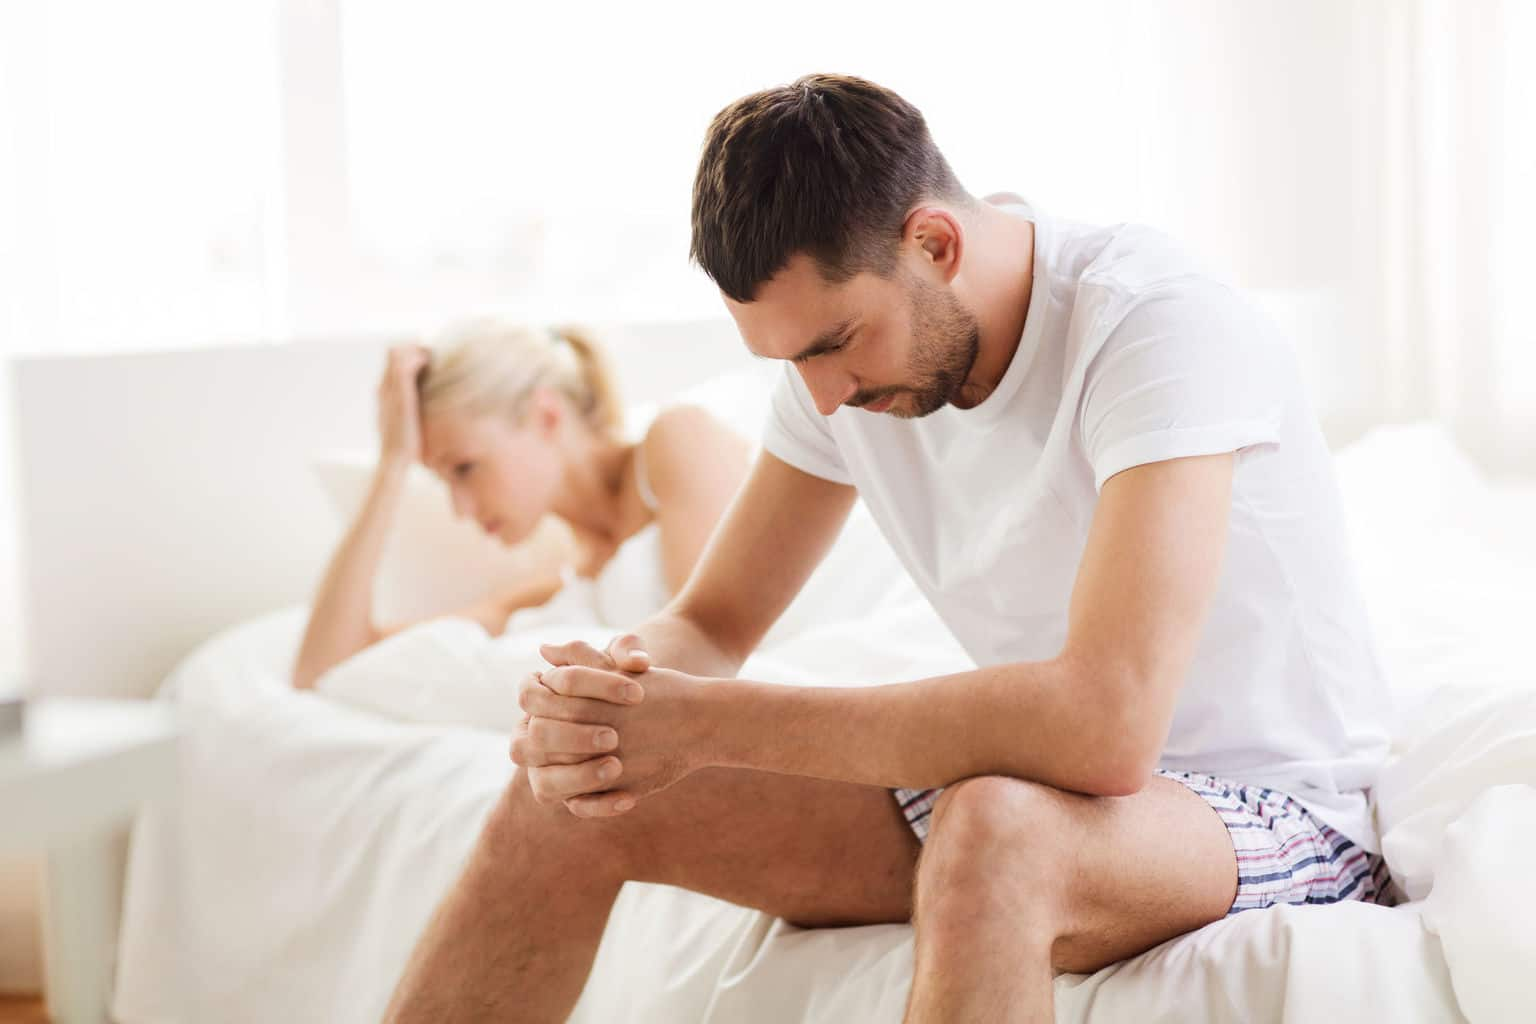 What causes penile fibrosis?